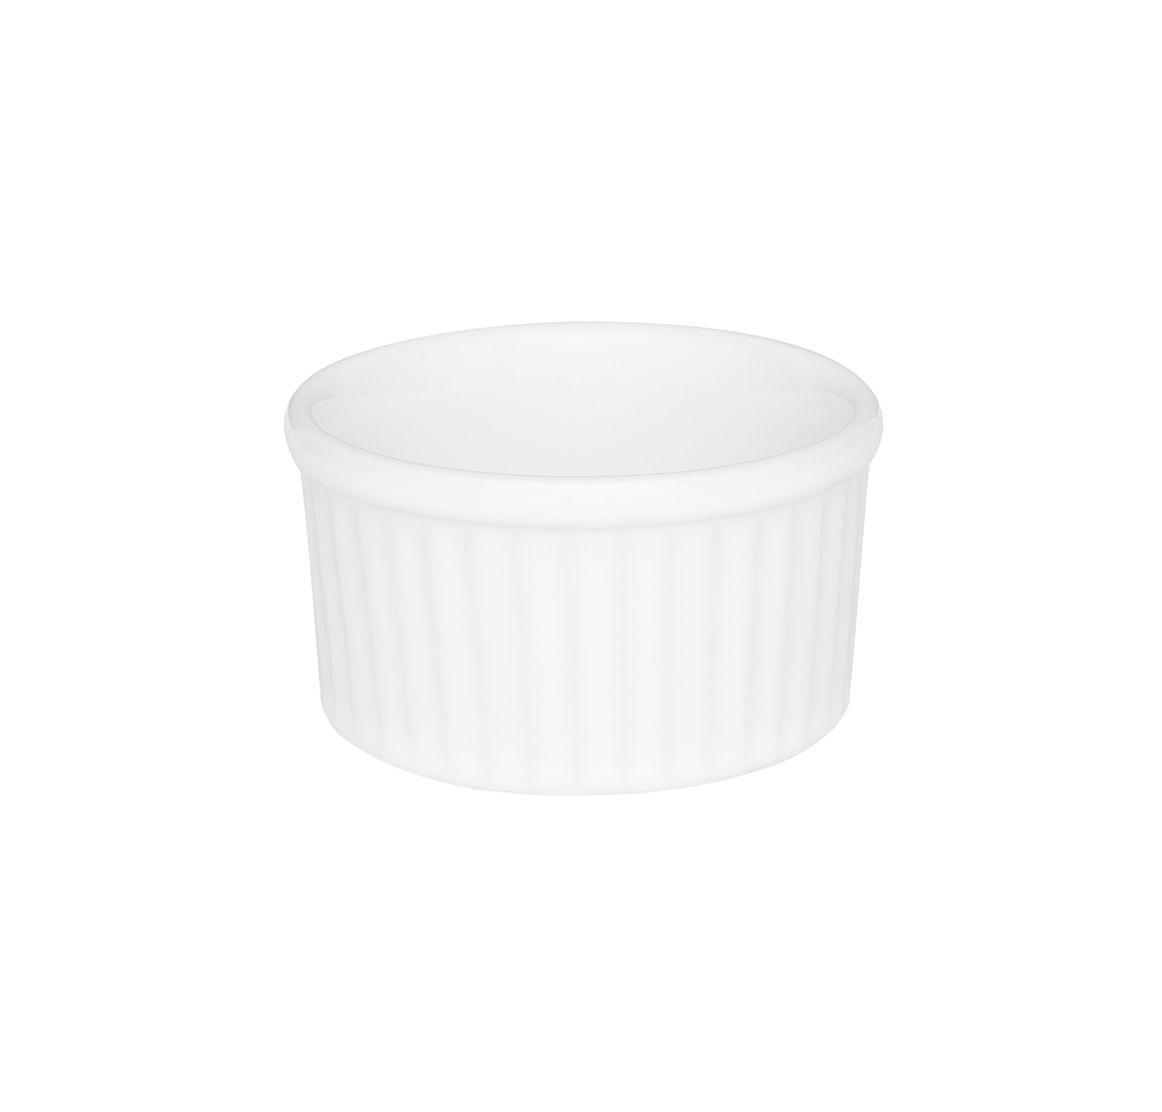 Tigela Ramequin 8X4Cm 100Ml - Branco - Oxford Cookware